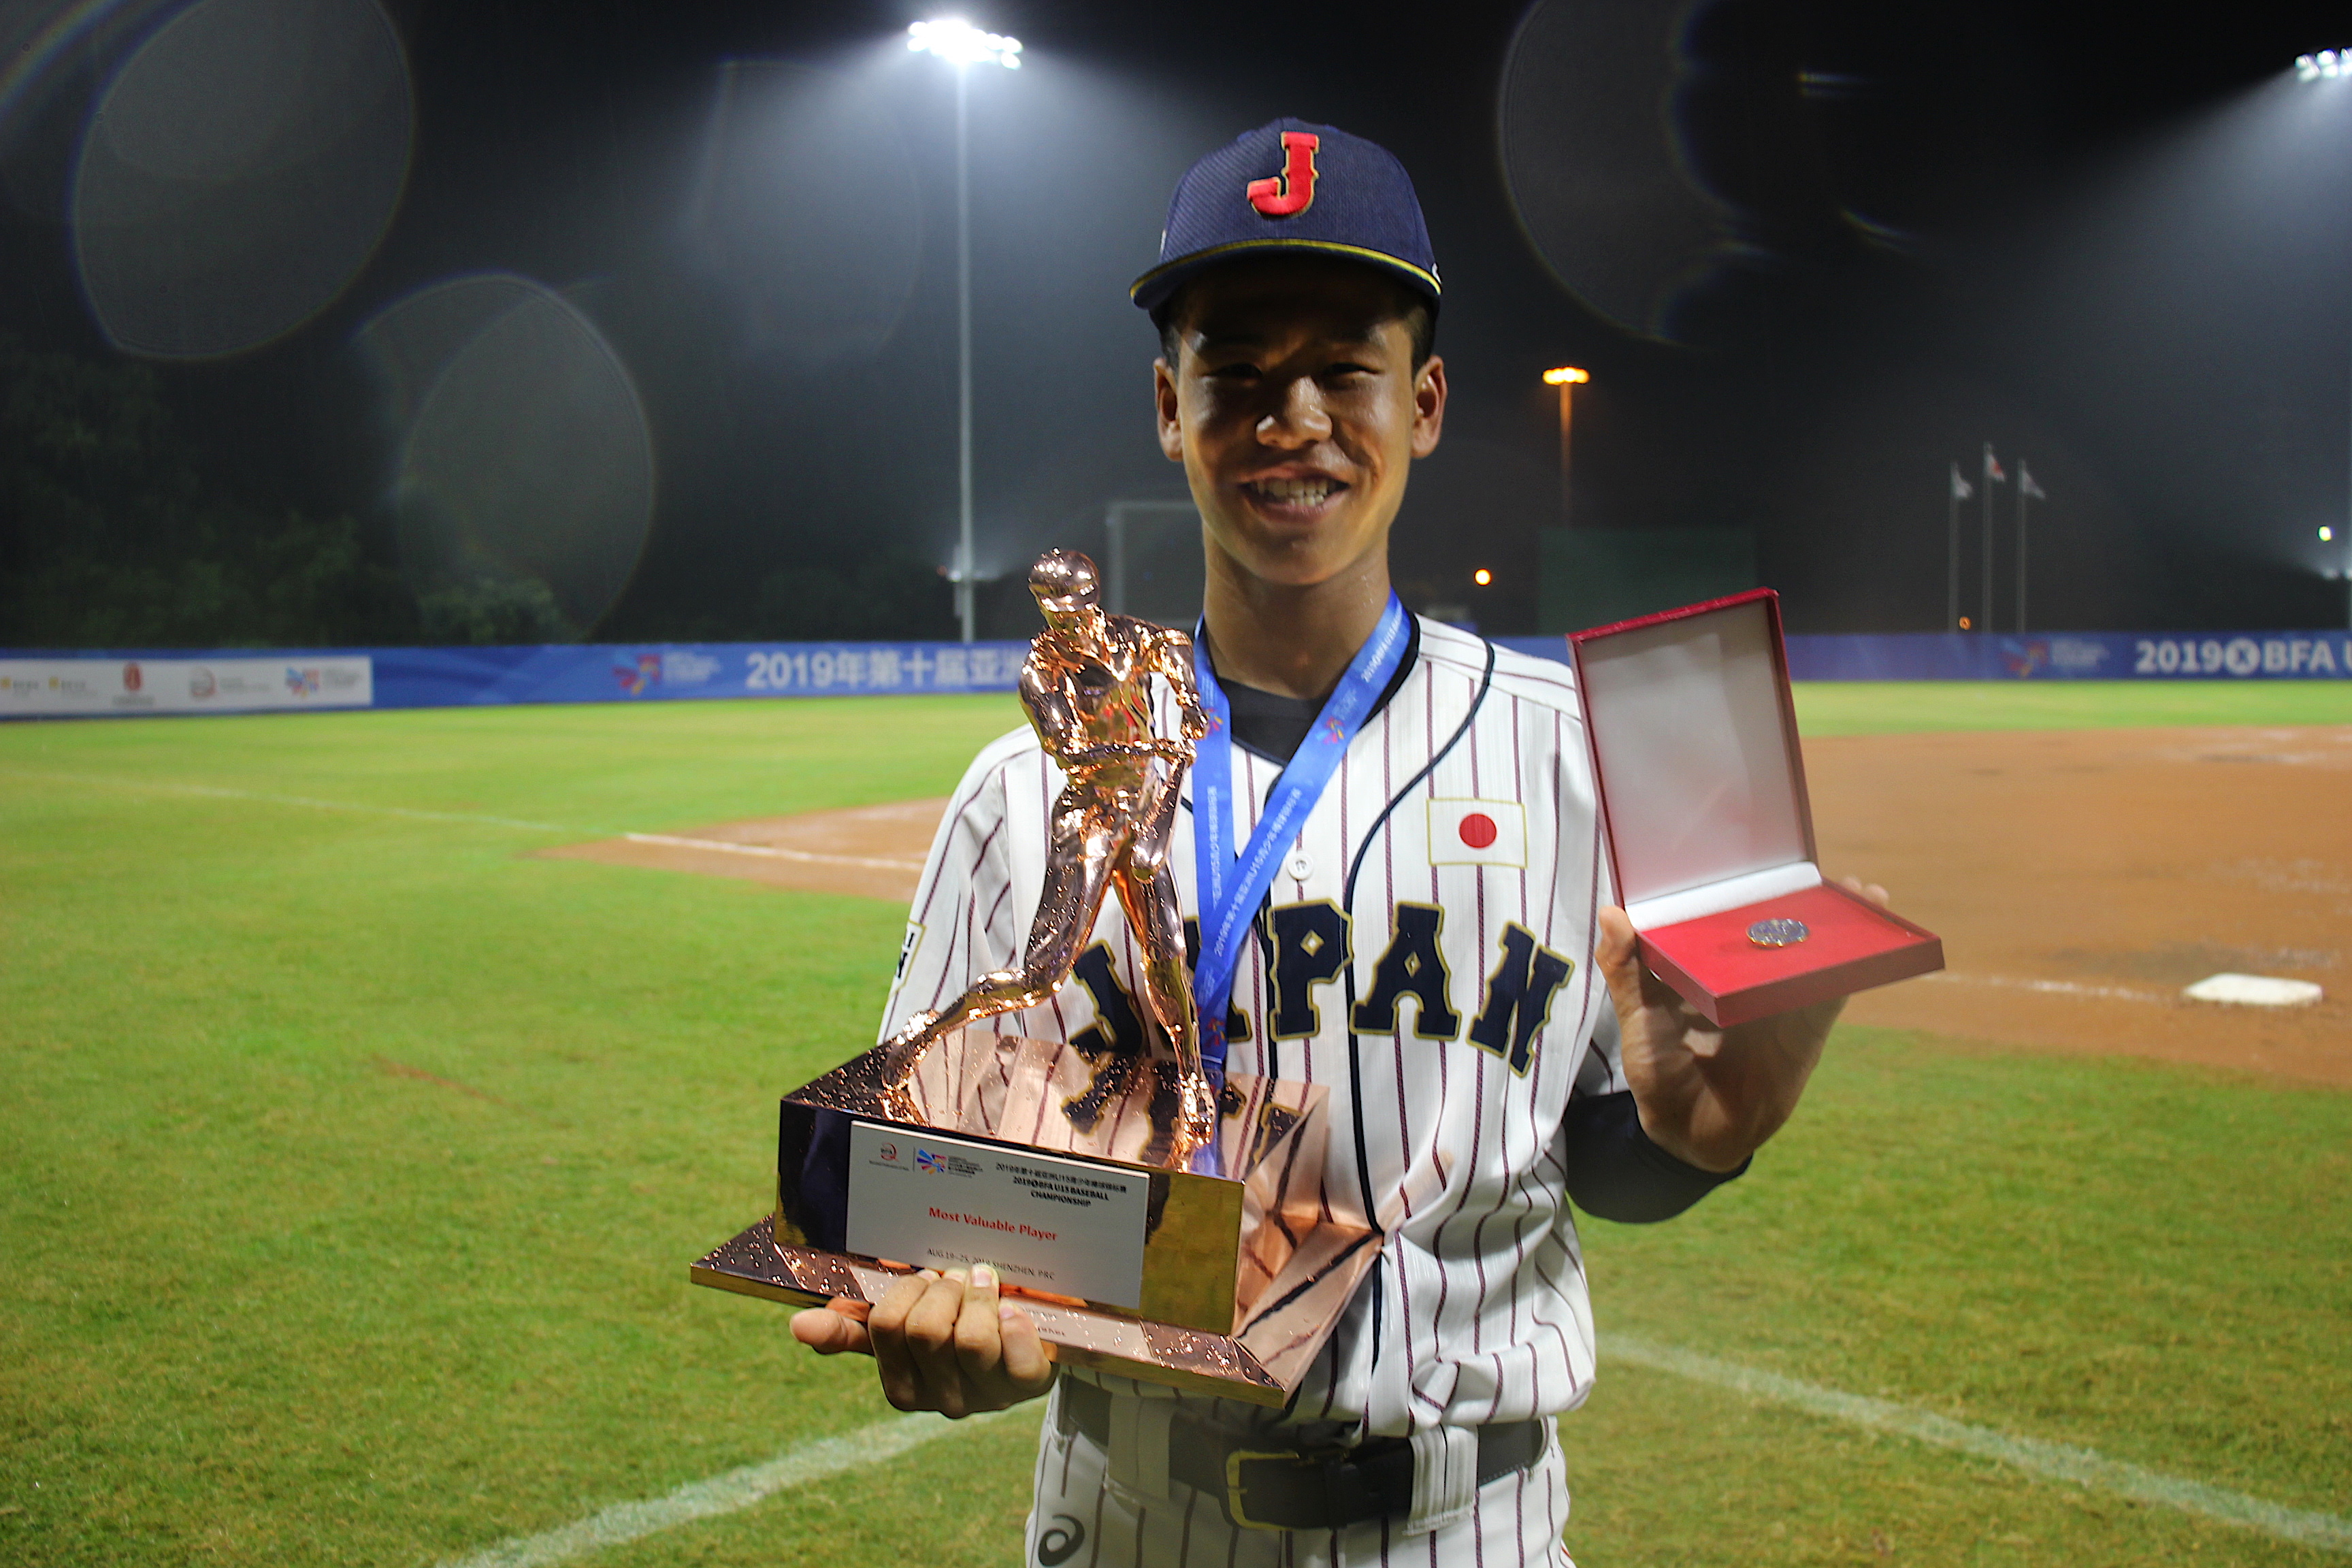 MVPを獲得した渡辺優斗選手(門真ビックドリームス出身)